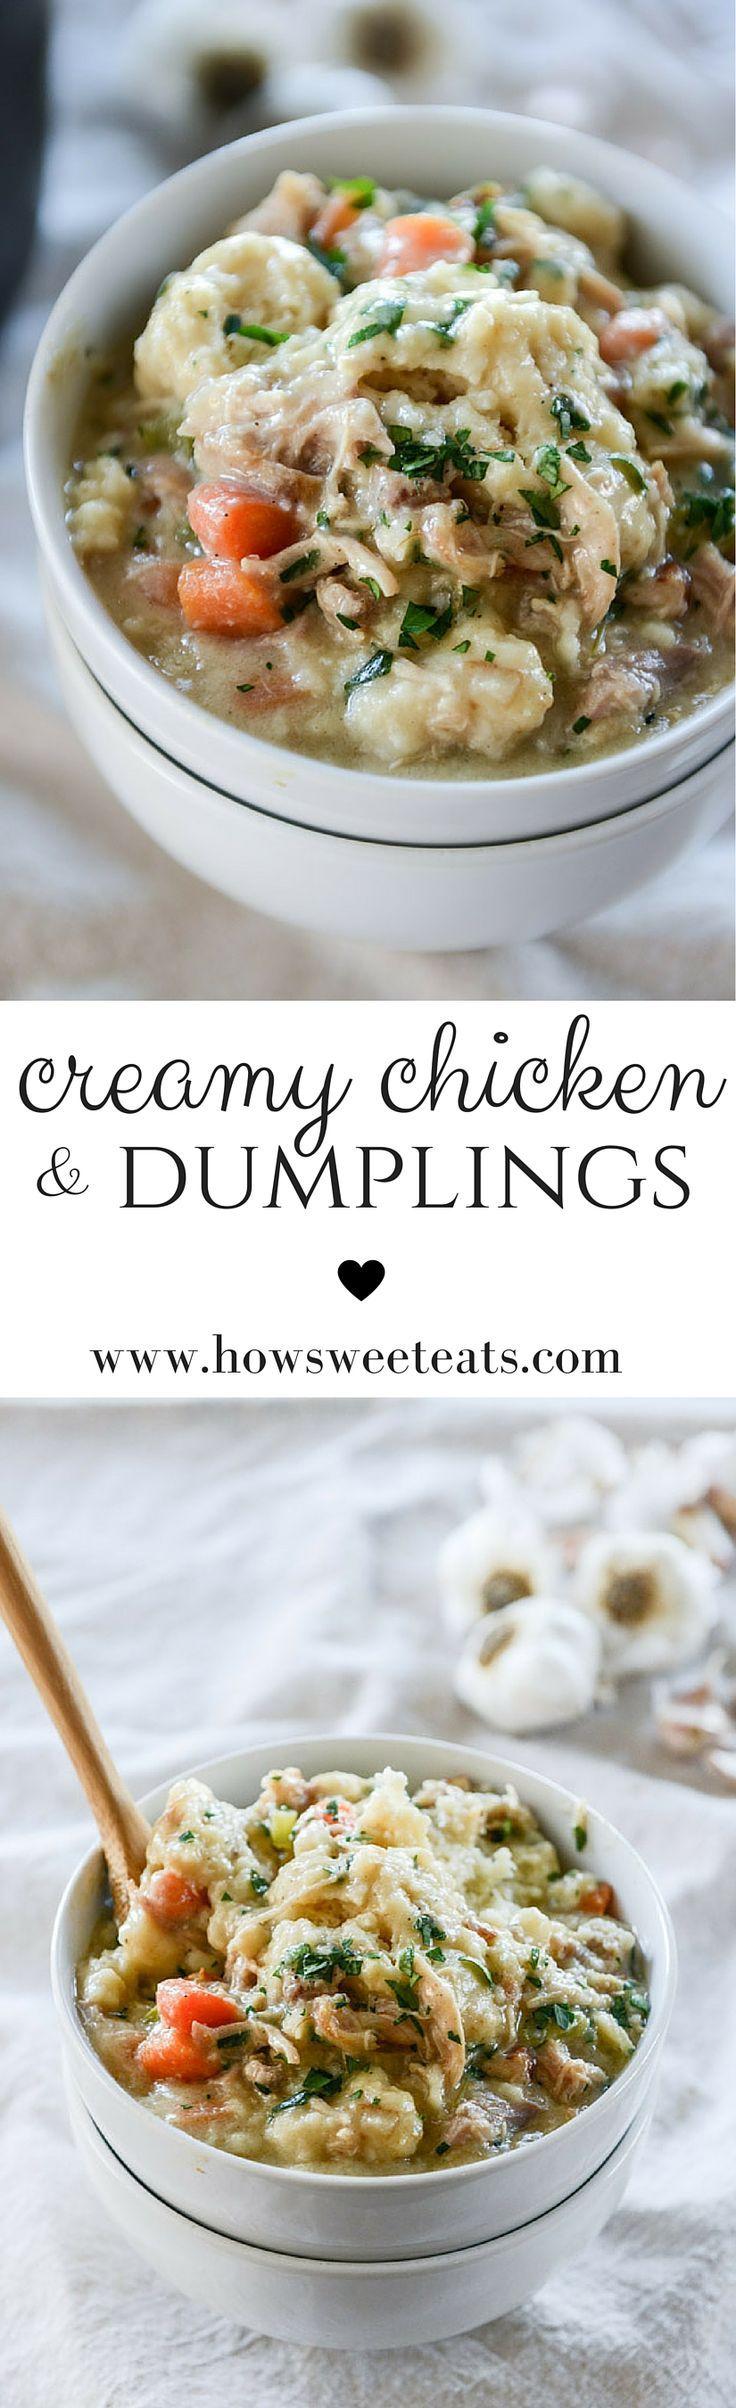 Creamy Chicken and Dumplings by @howsweeteats I howsweeteats.com